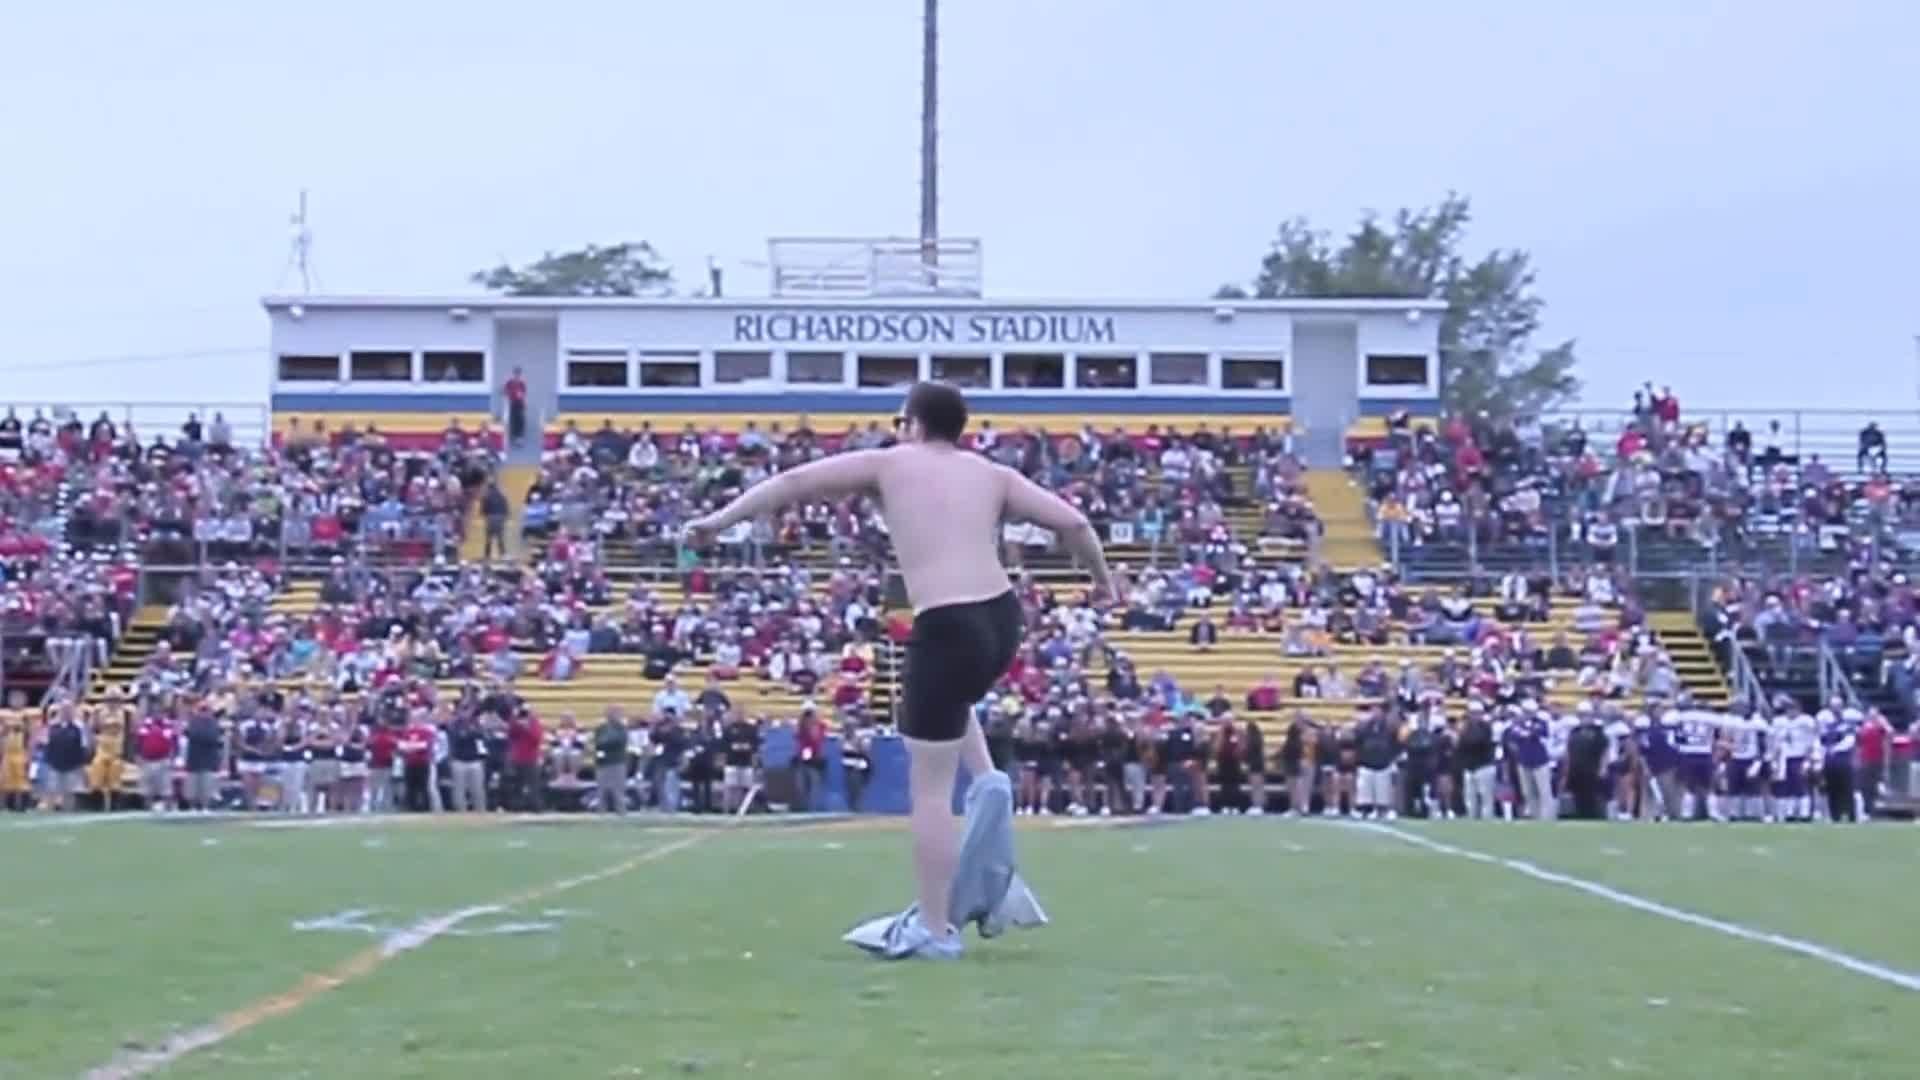 Streaker Interrupts Ysleta High School Homecoming Game